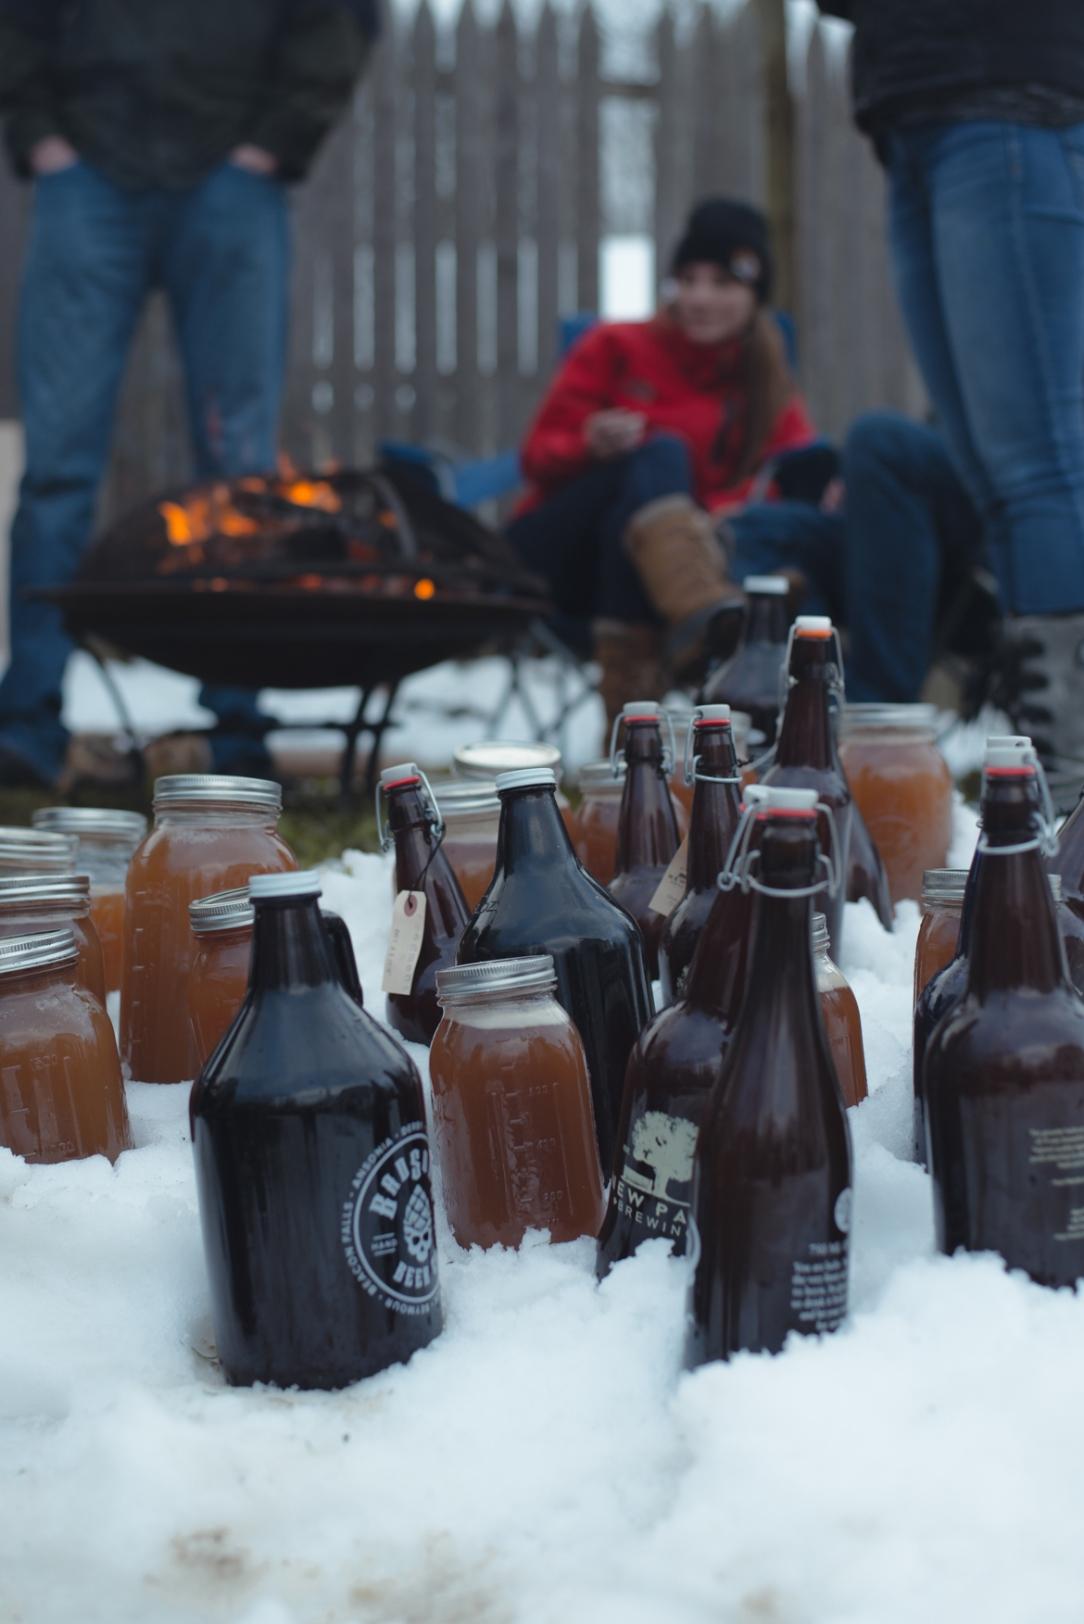 make-apple-cider-new-england-campfire-winter-2